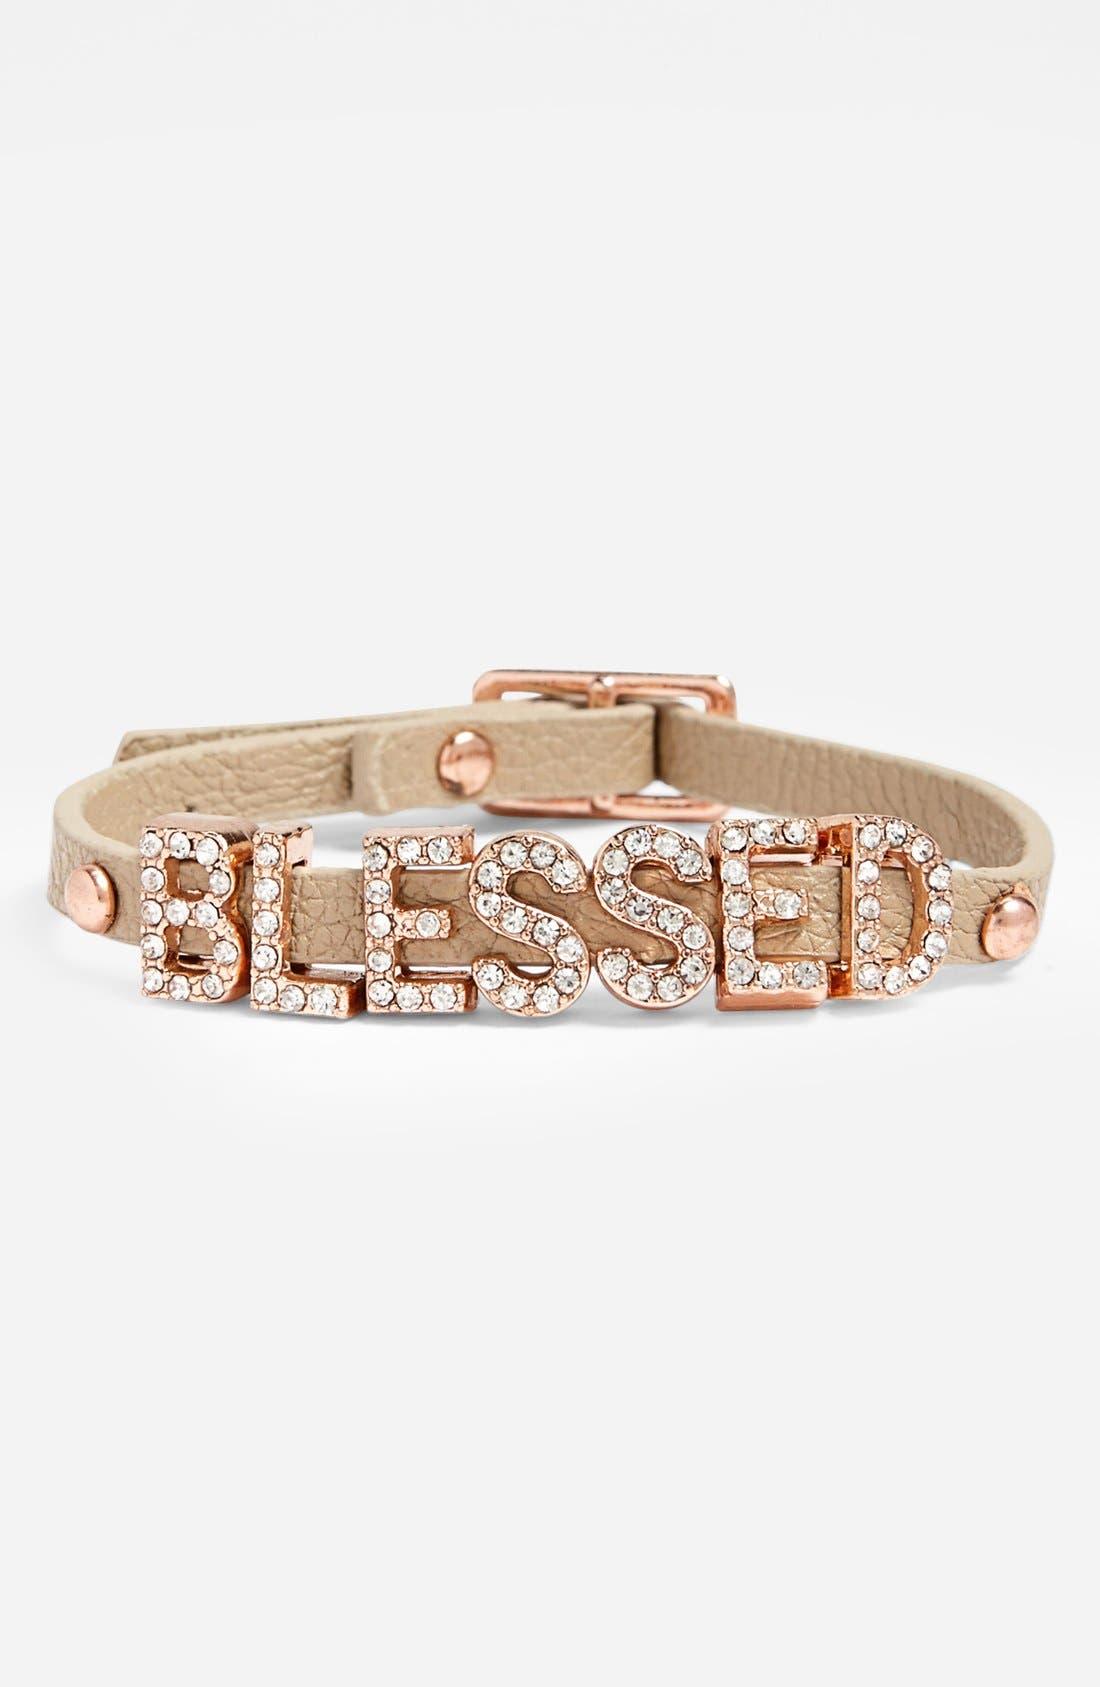 Main Image - BCBGeneration 'Sparkly Blessed' Bracelet